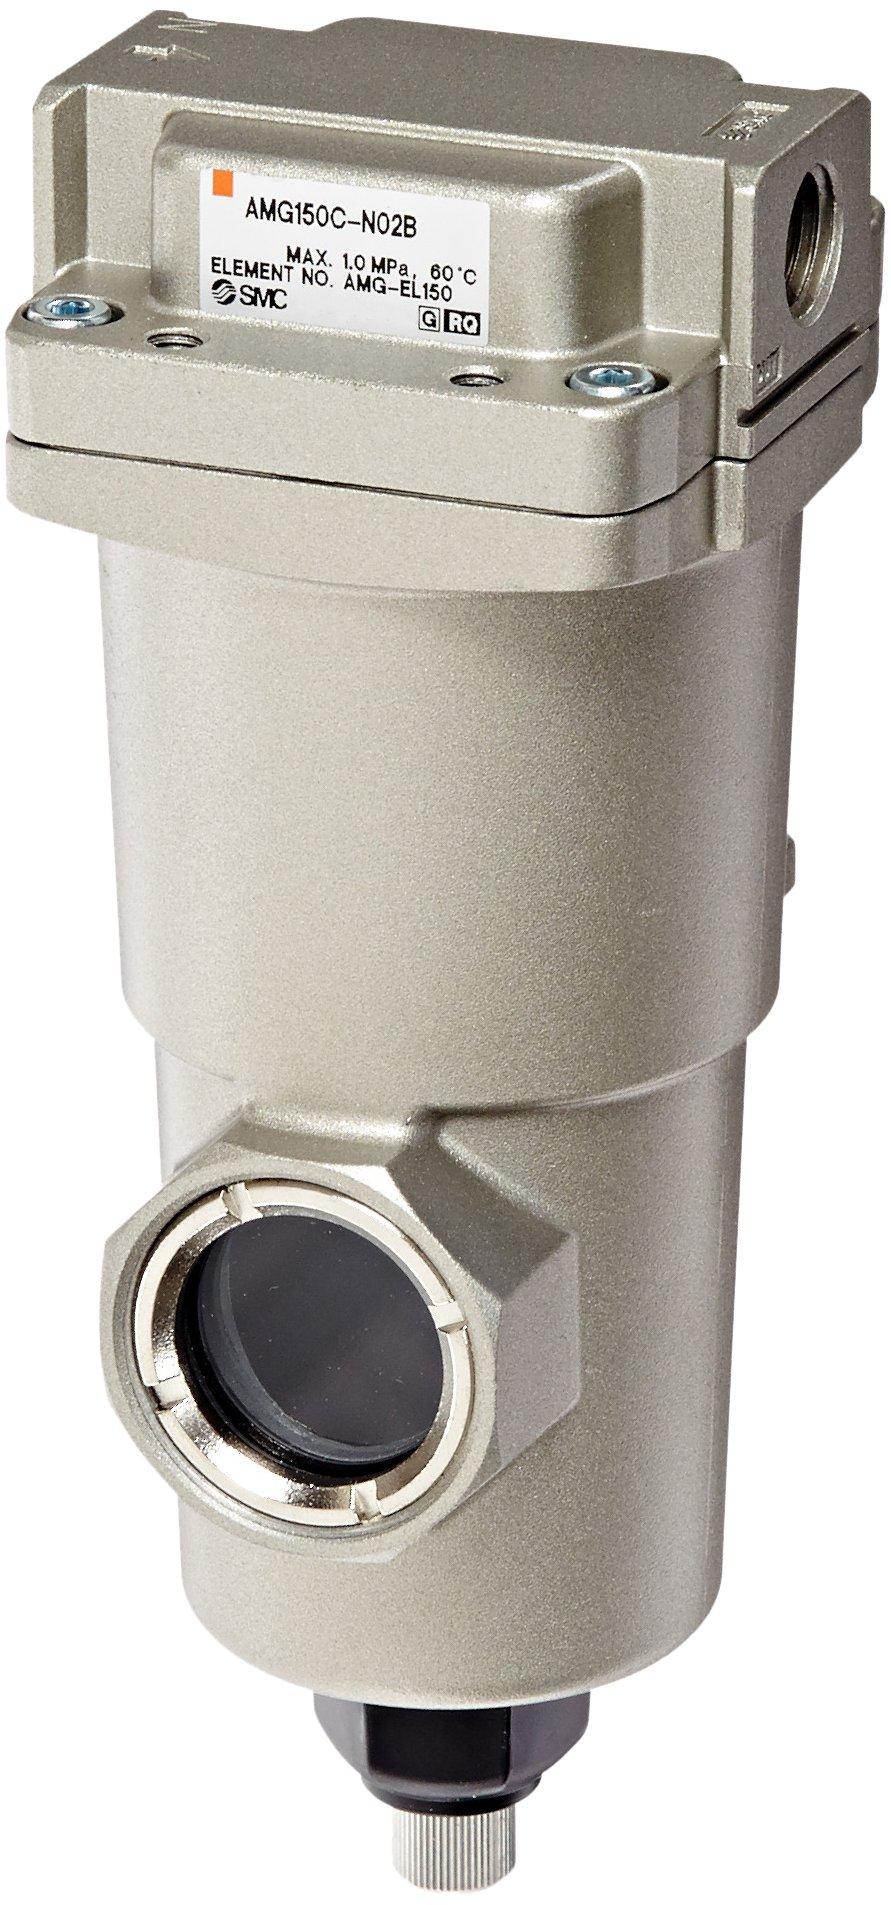 SMC AMG150C-N02B Water Separator, Manual Drain, 300 L/min, 1/4'' NPT, Mounting Bracket by SMC